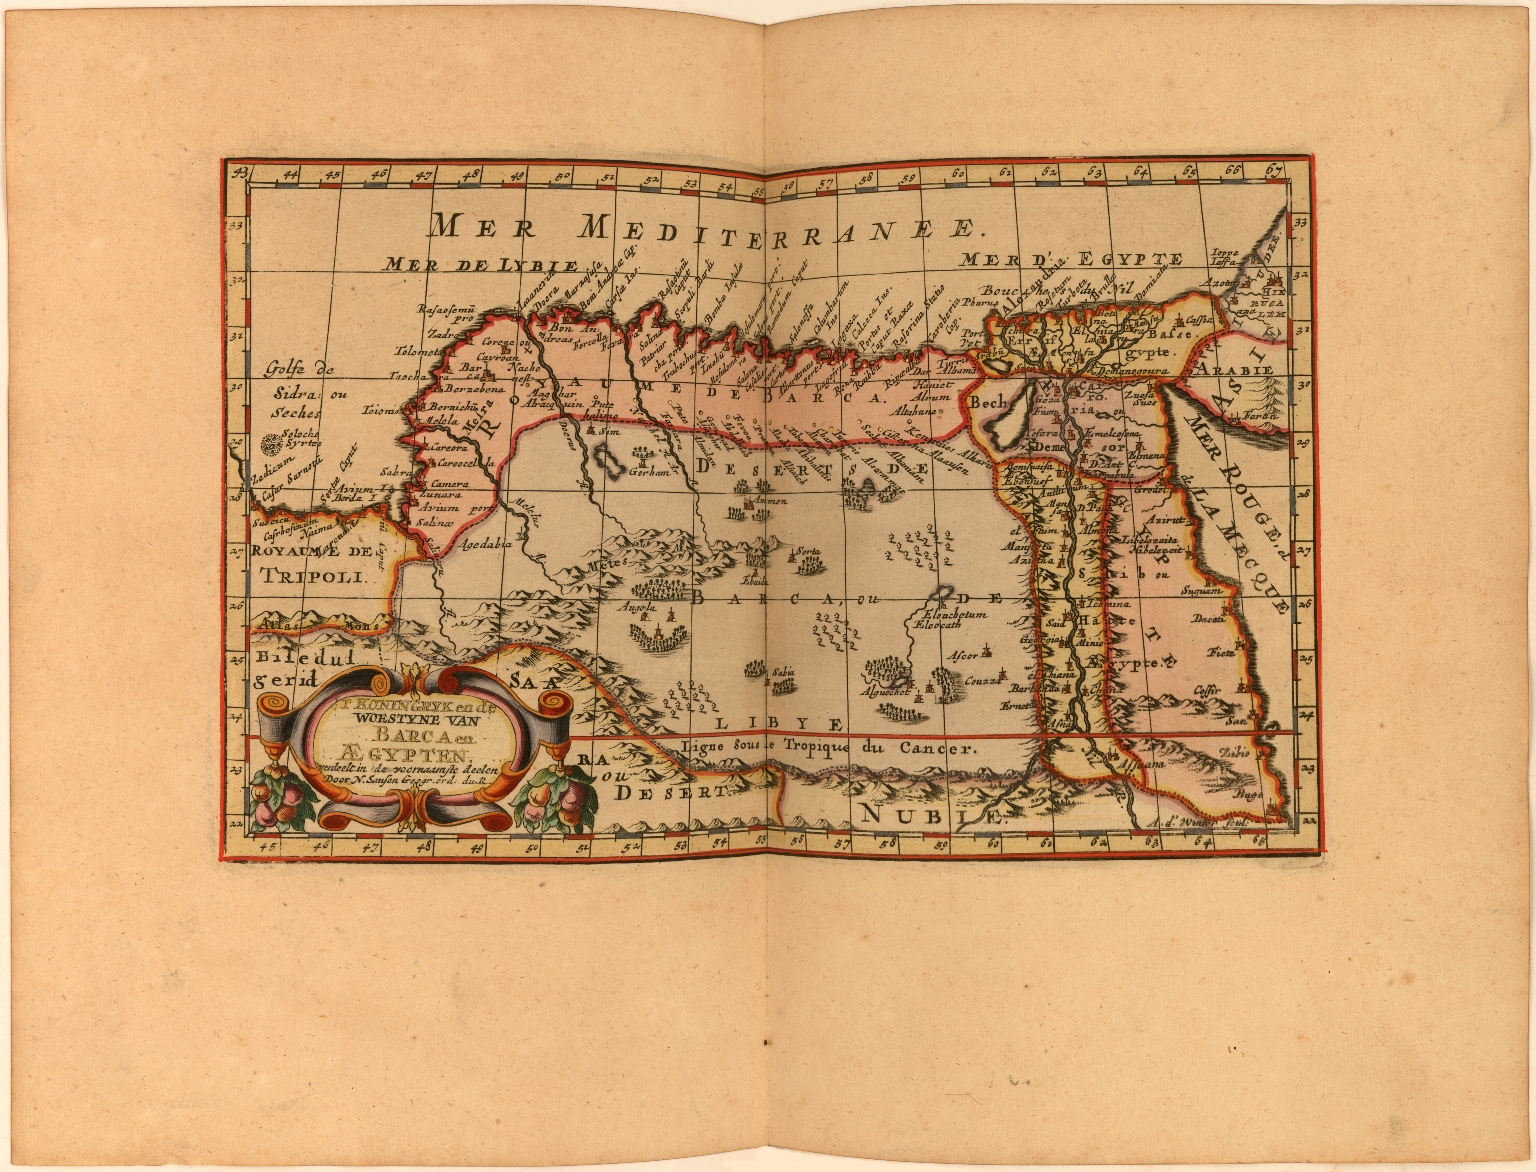 Egypten, verdeelt in zyne twaalf Cassilieen, of Landvoogdyen getrokken mit sanutus enz. Door N. Sanson d'Abbeville, Geographe du Roy.